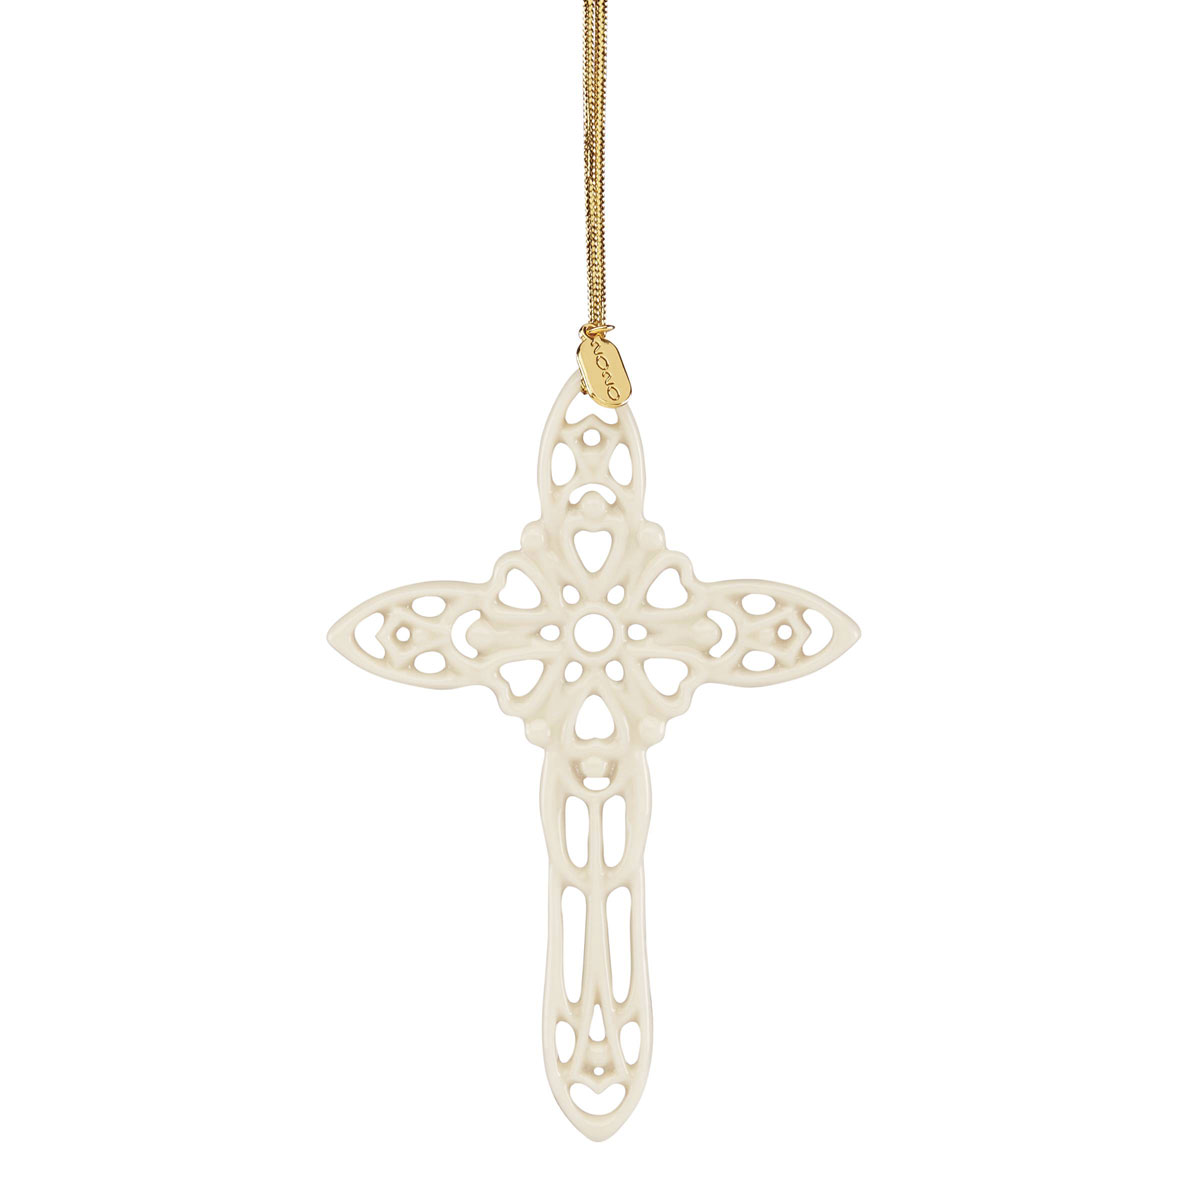 Lenox Snow Fantasies 2020 Cross Ornament